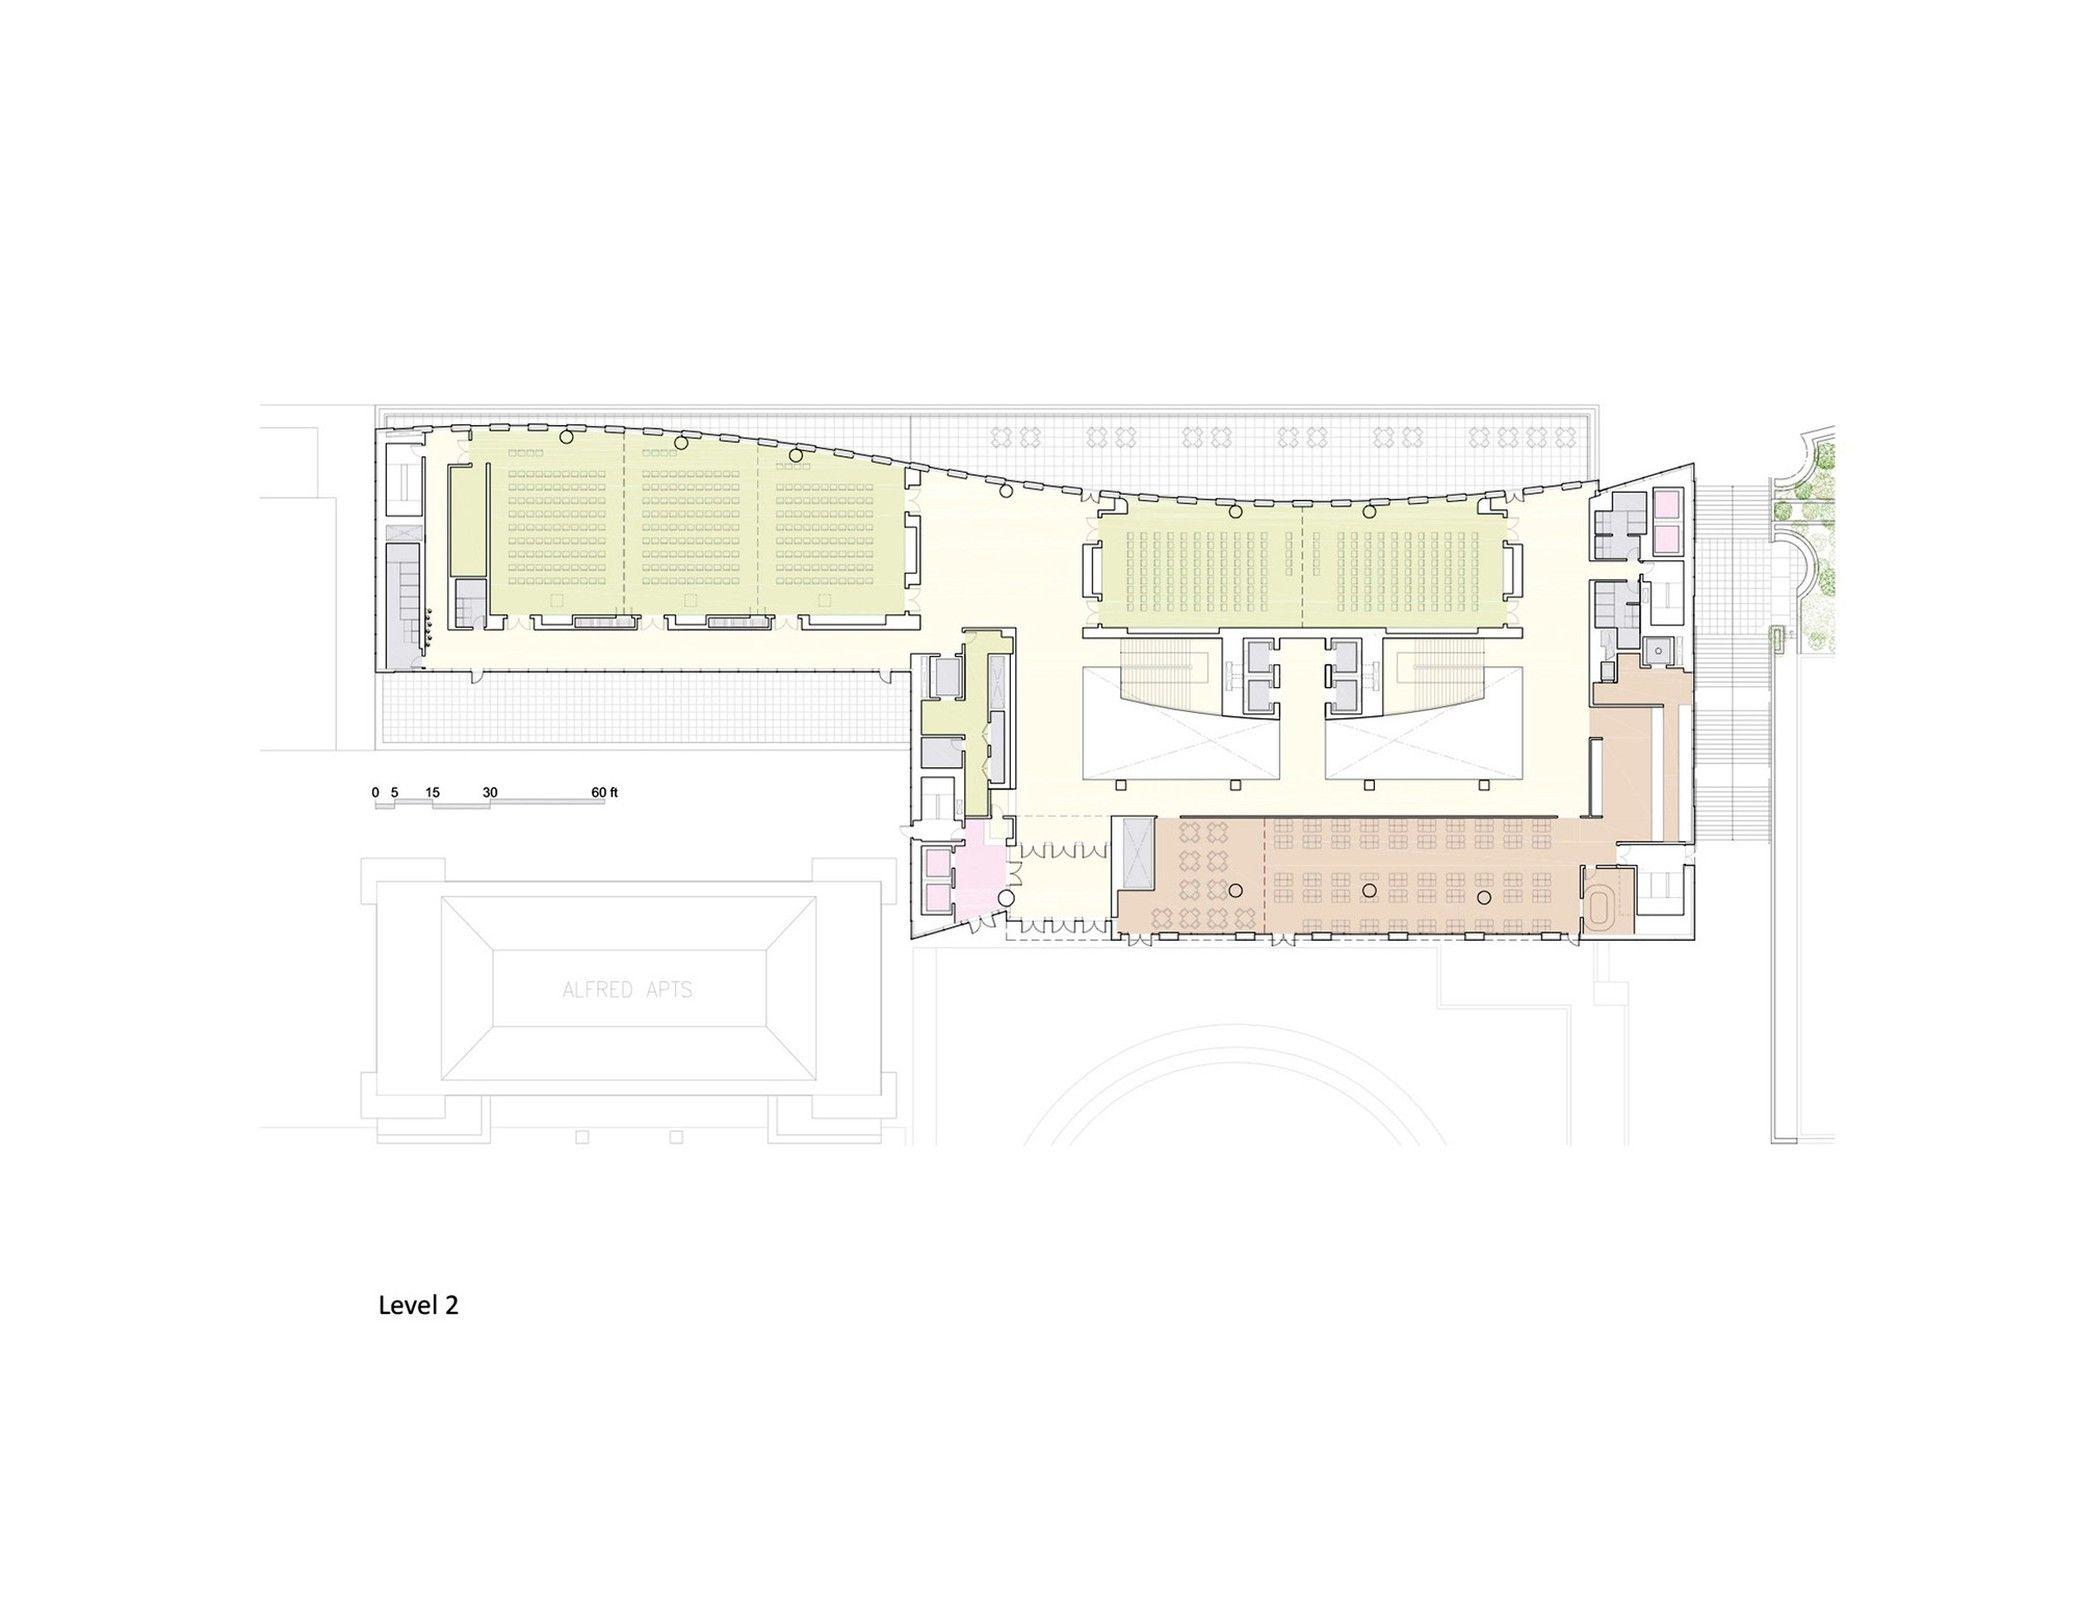 New Fordham Law School Pei Cobb Freed Partners Arch2o Com Law School Free Floor Plans Architecture